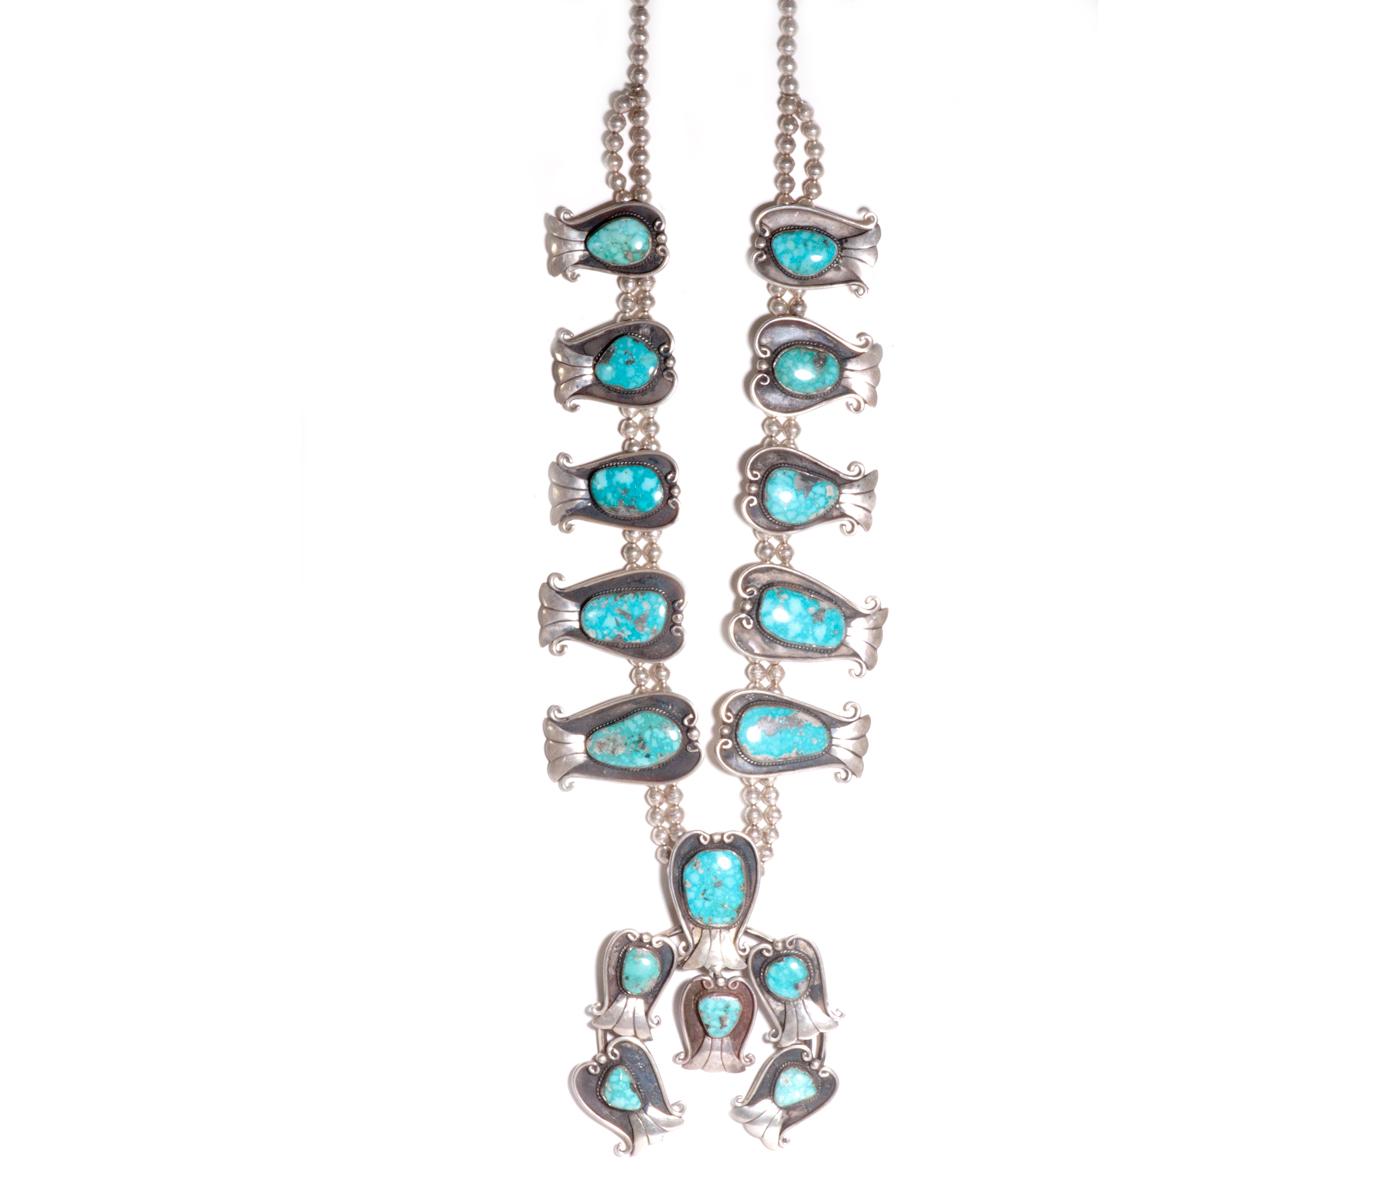 Vintage Squash Blossom Necklace